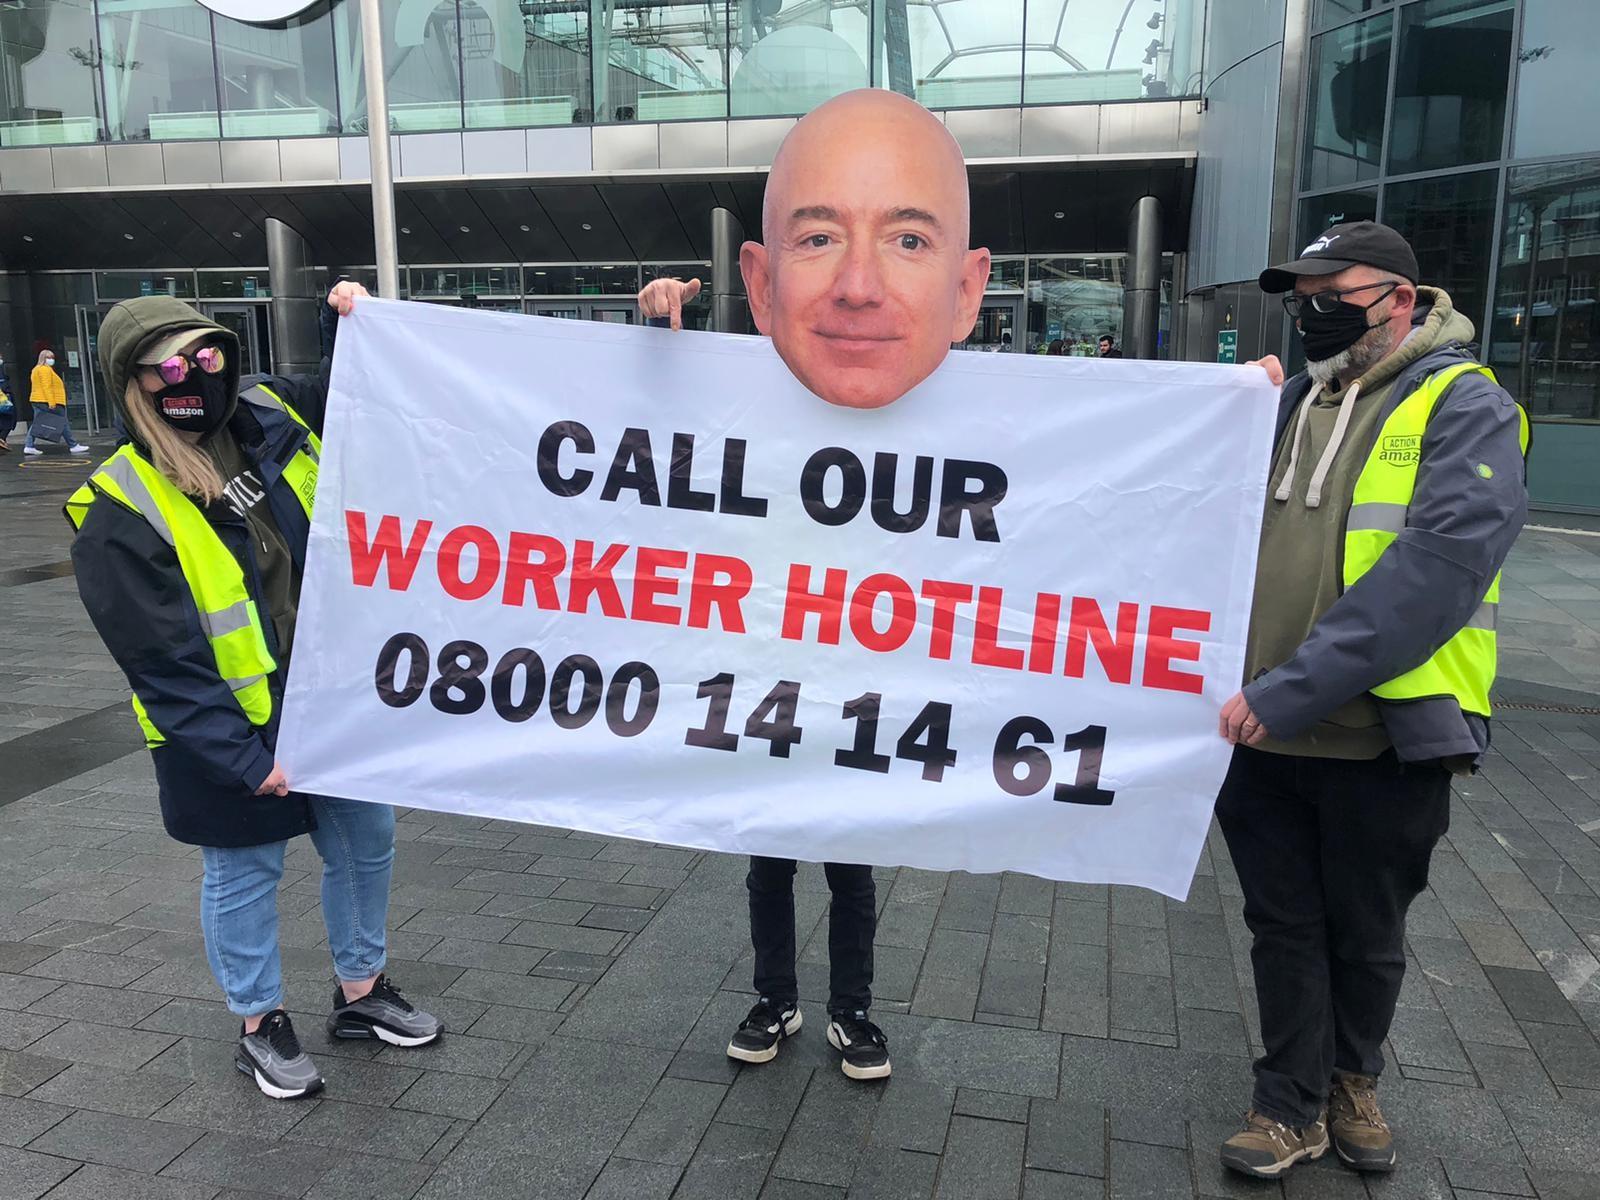 Amazon workers hotline banner